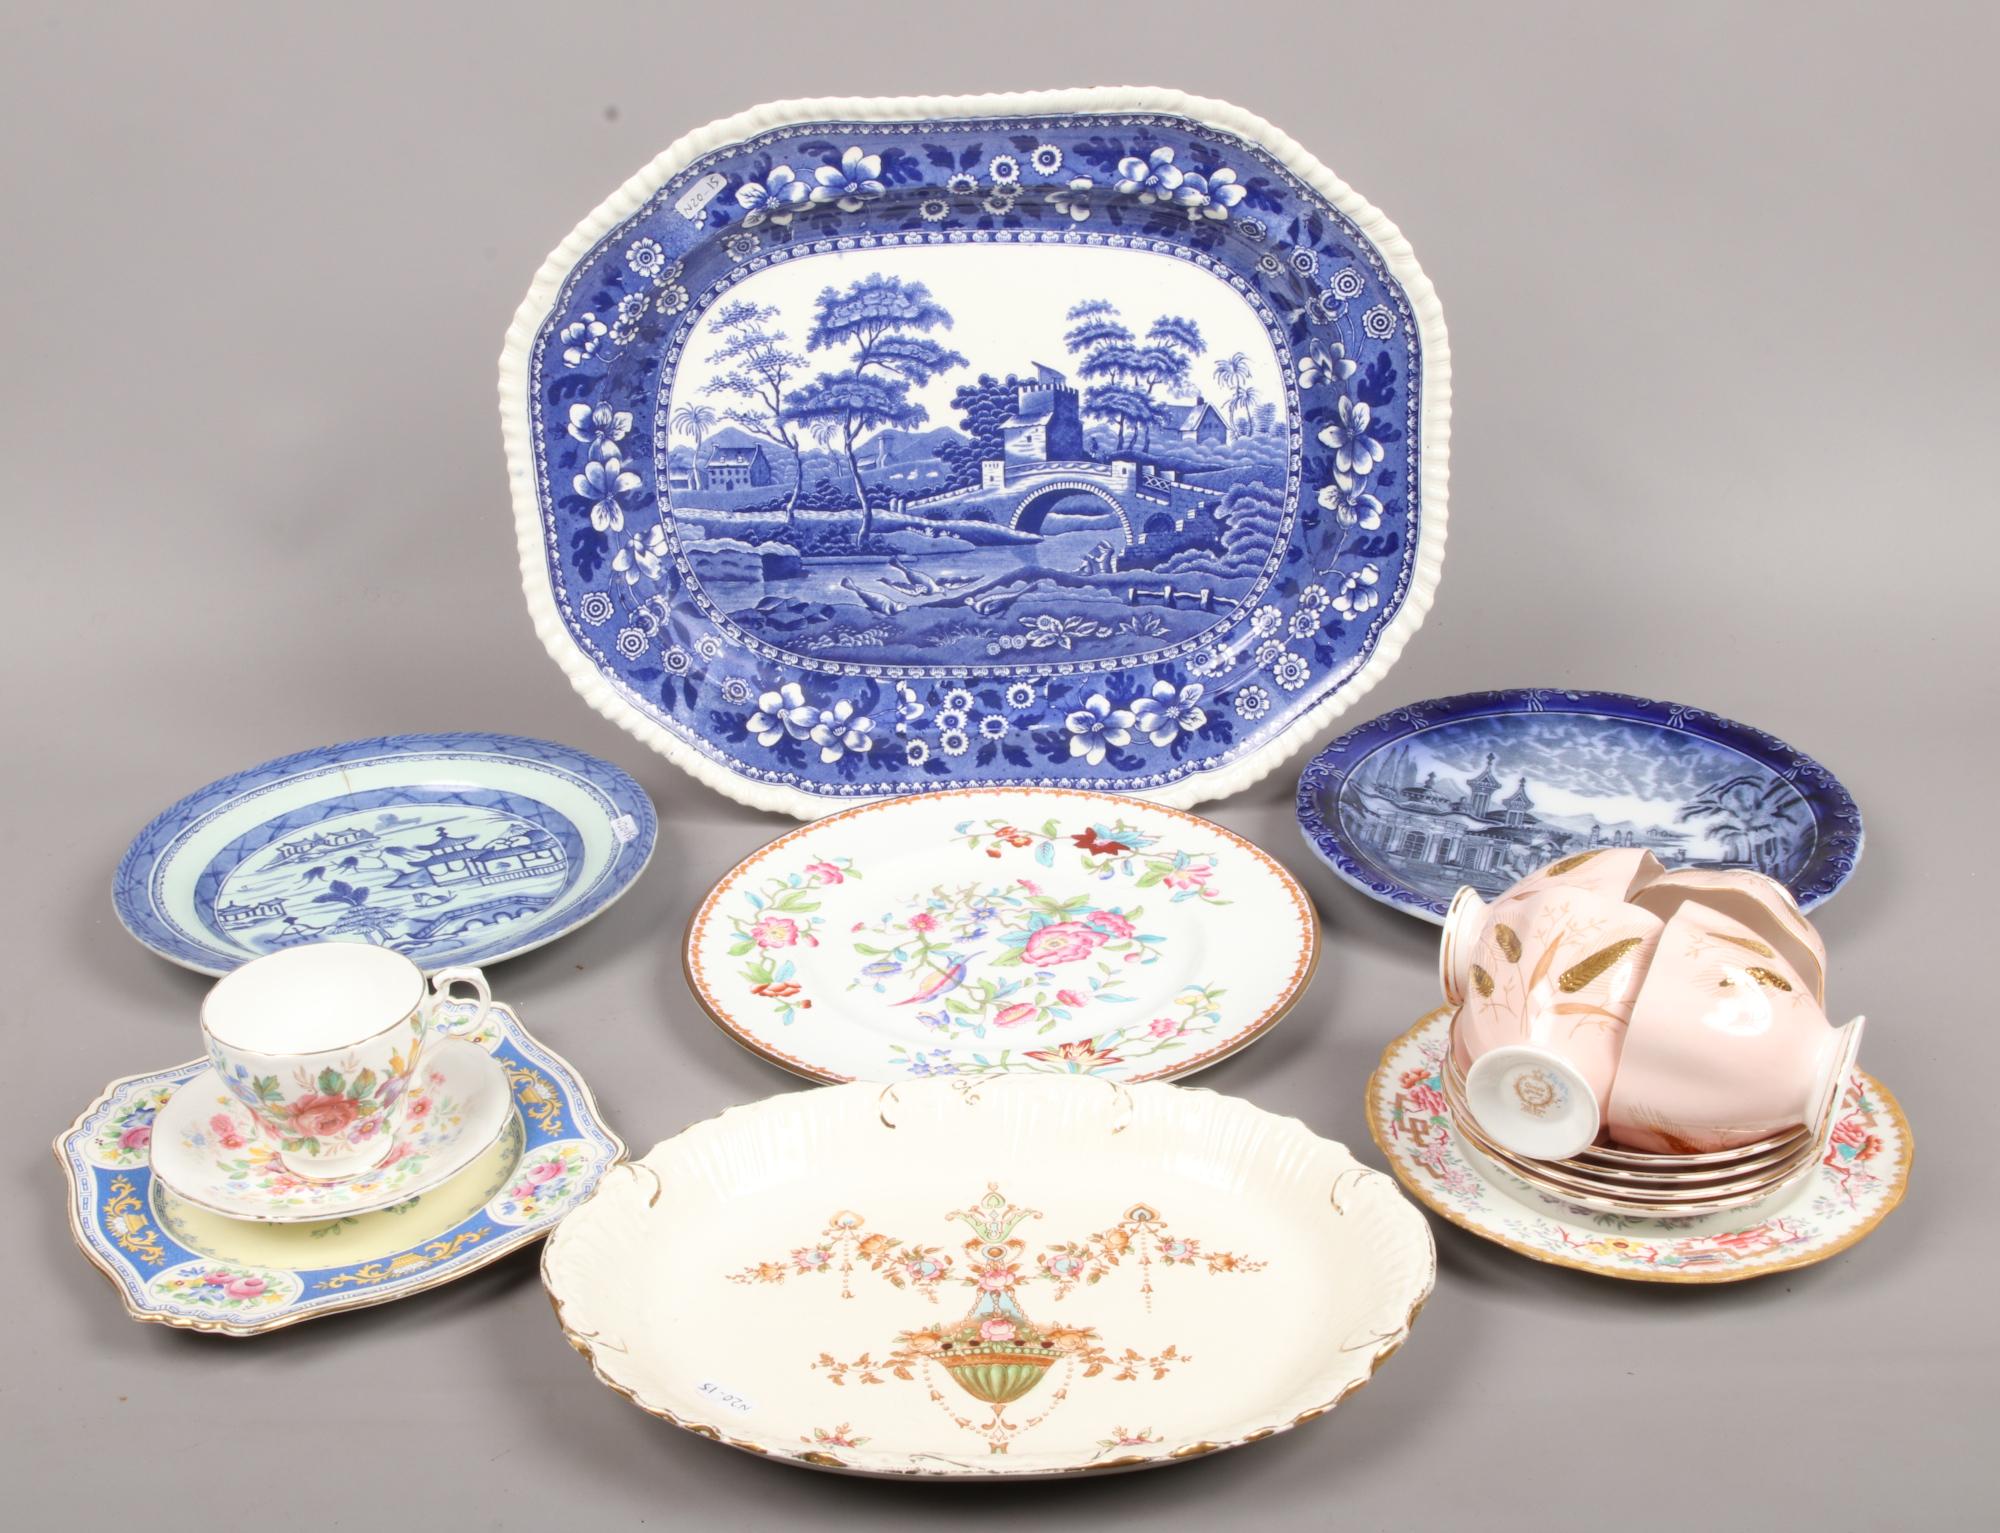 Lot 30 - A collection of ceramics to include Paragon, Spode, Coalport, Crown Devon etc.